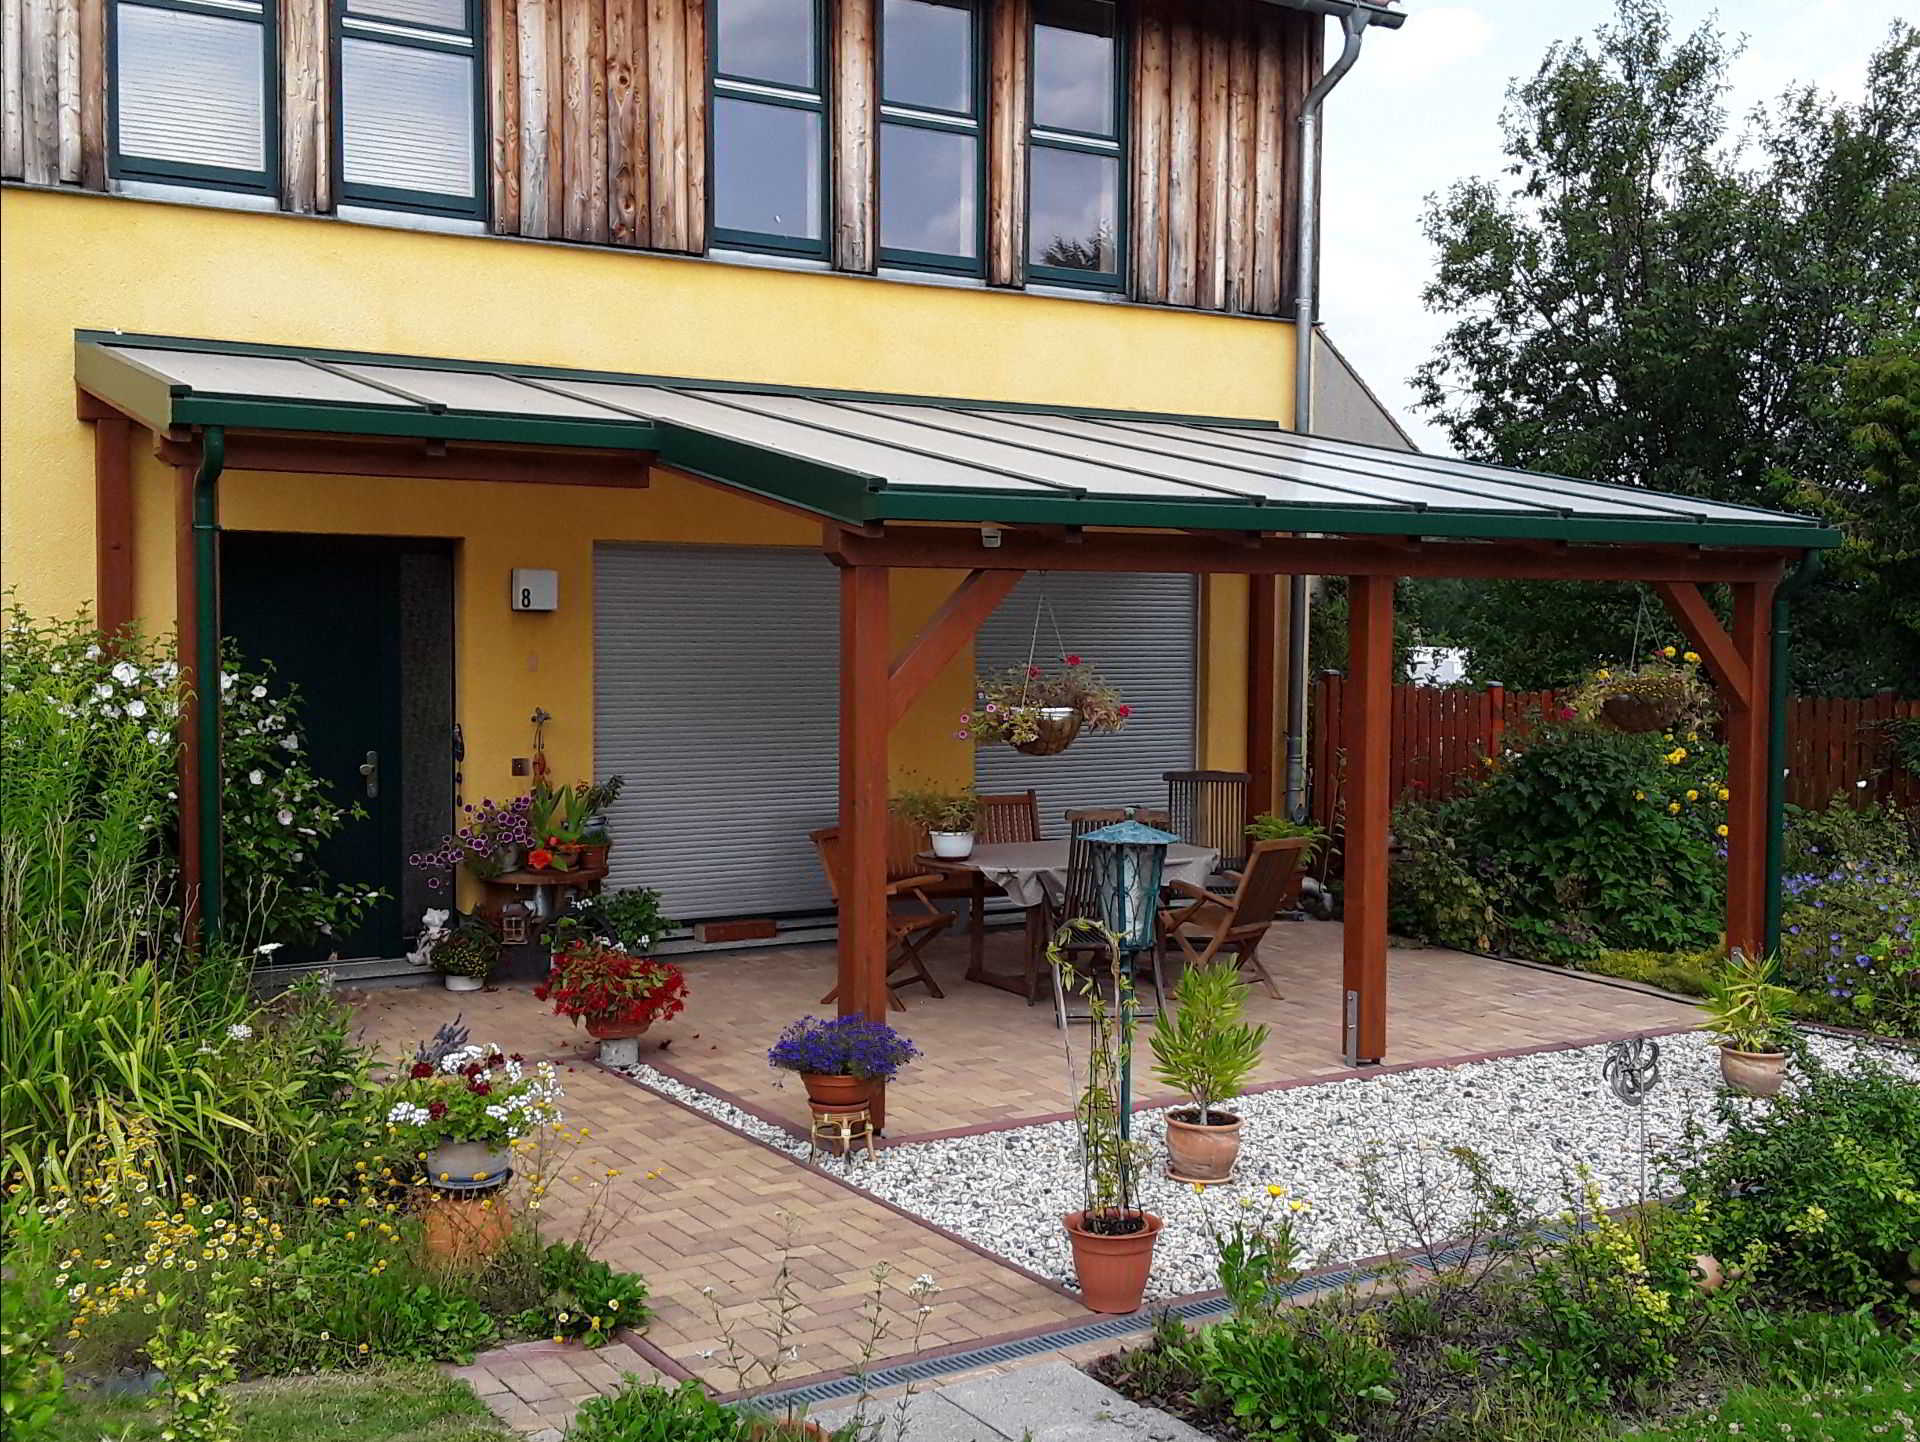 Hds Terrassenuberdachung Terrassendach Aluminium Holz